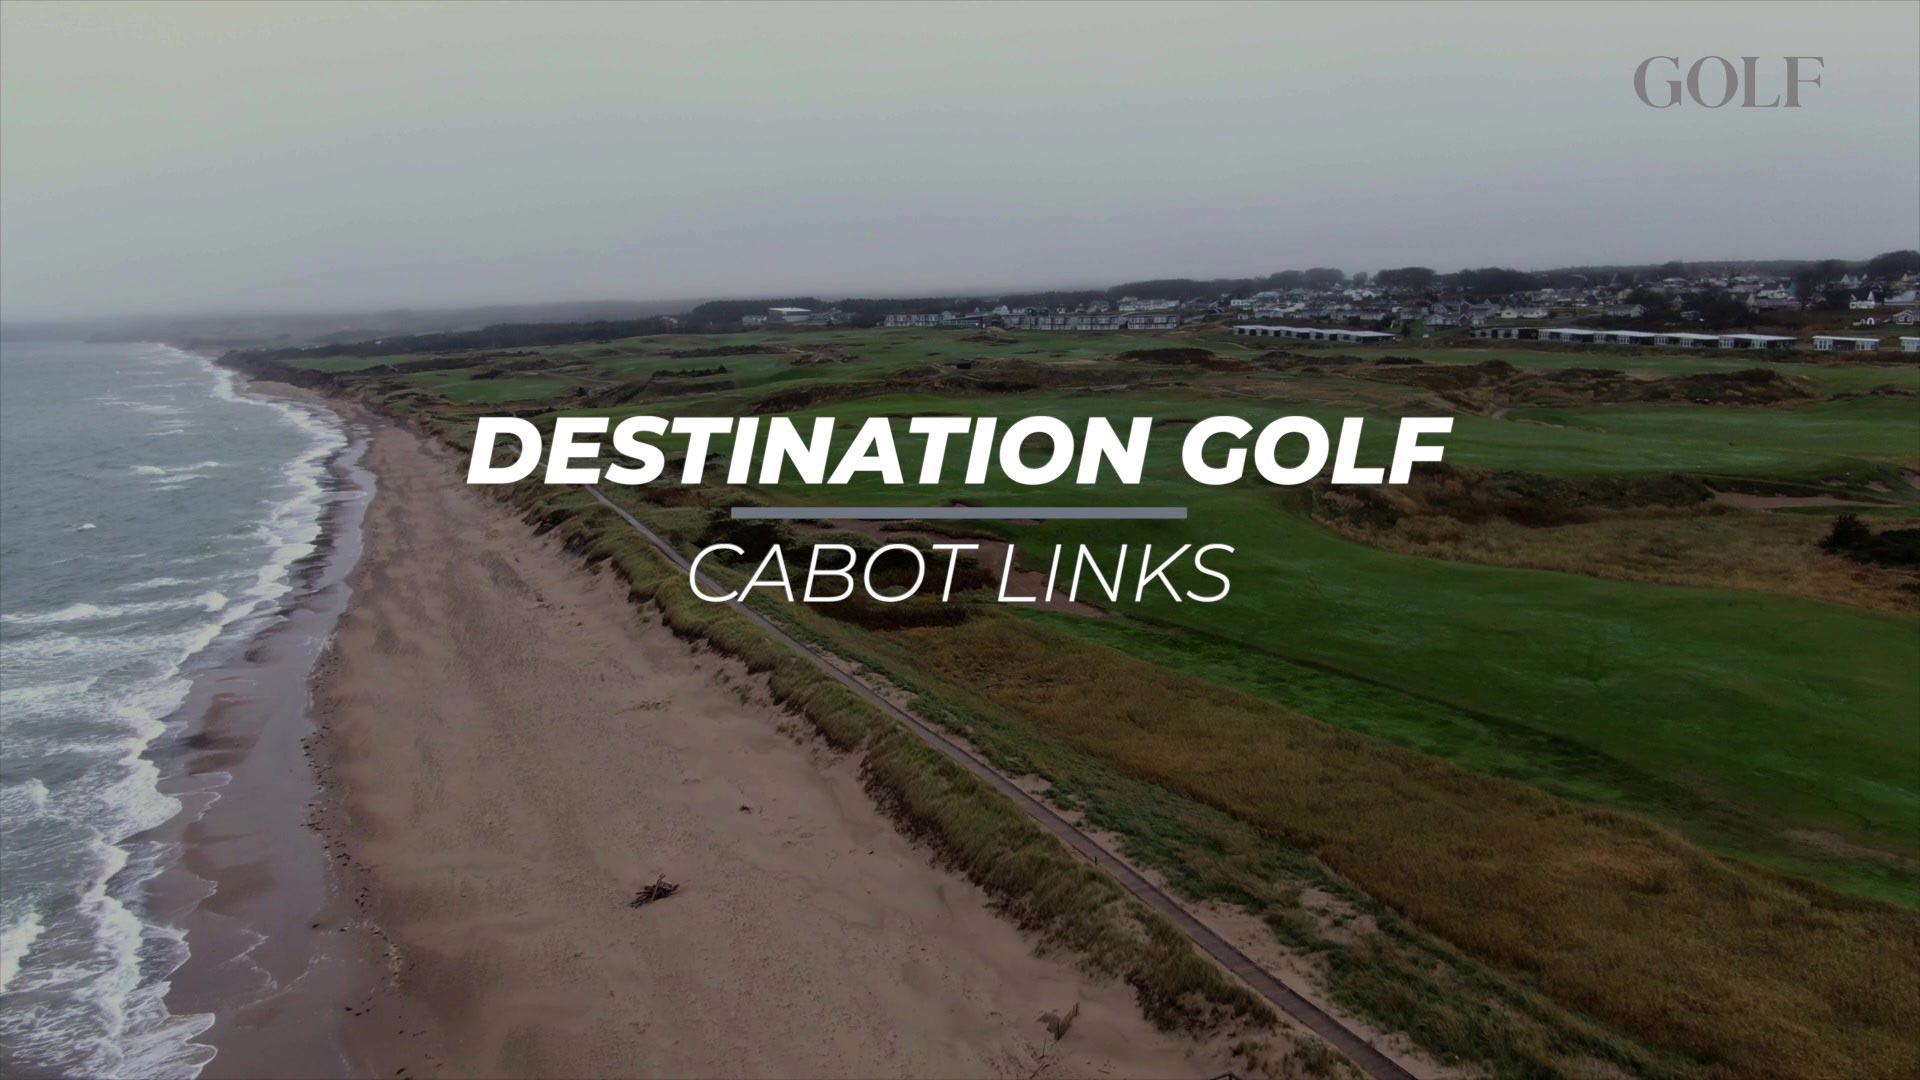 Destination Golf: Cabot Links